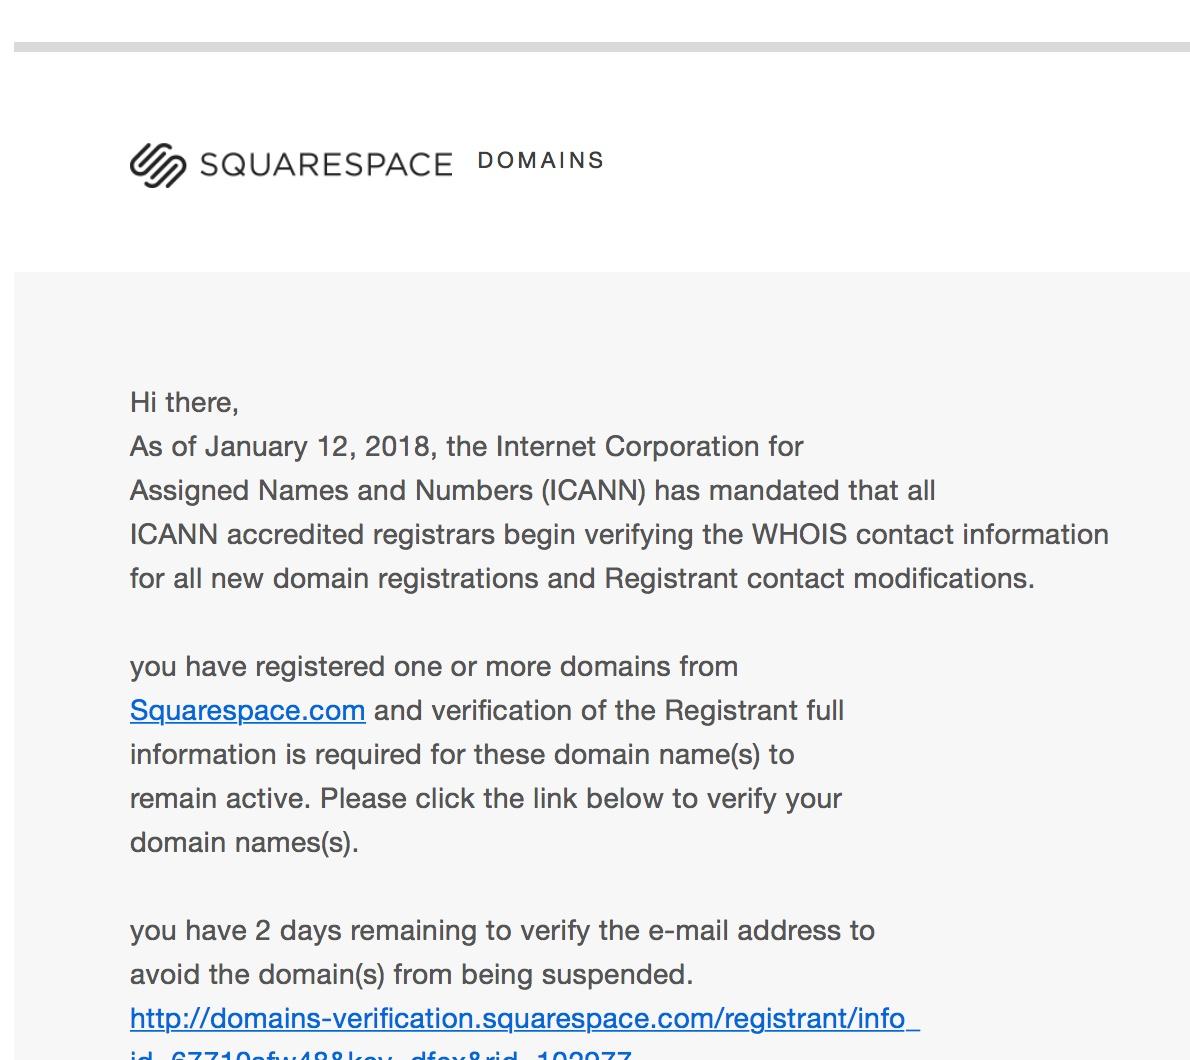 Screenshot of a fake spam email posing as Squarespace.